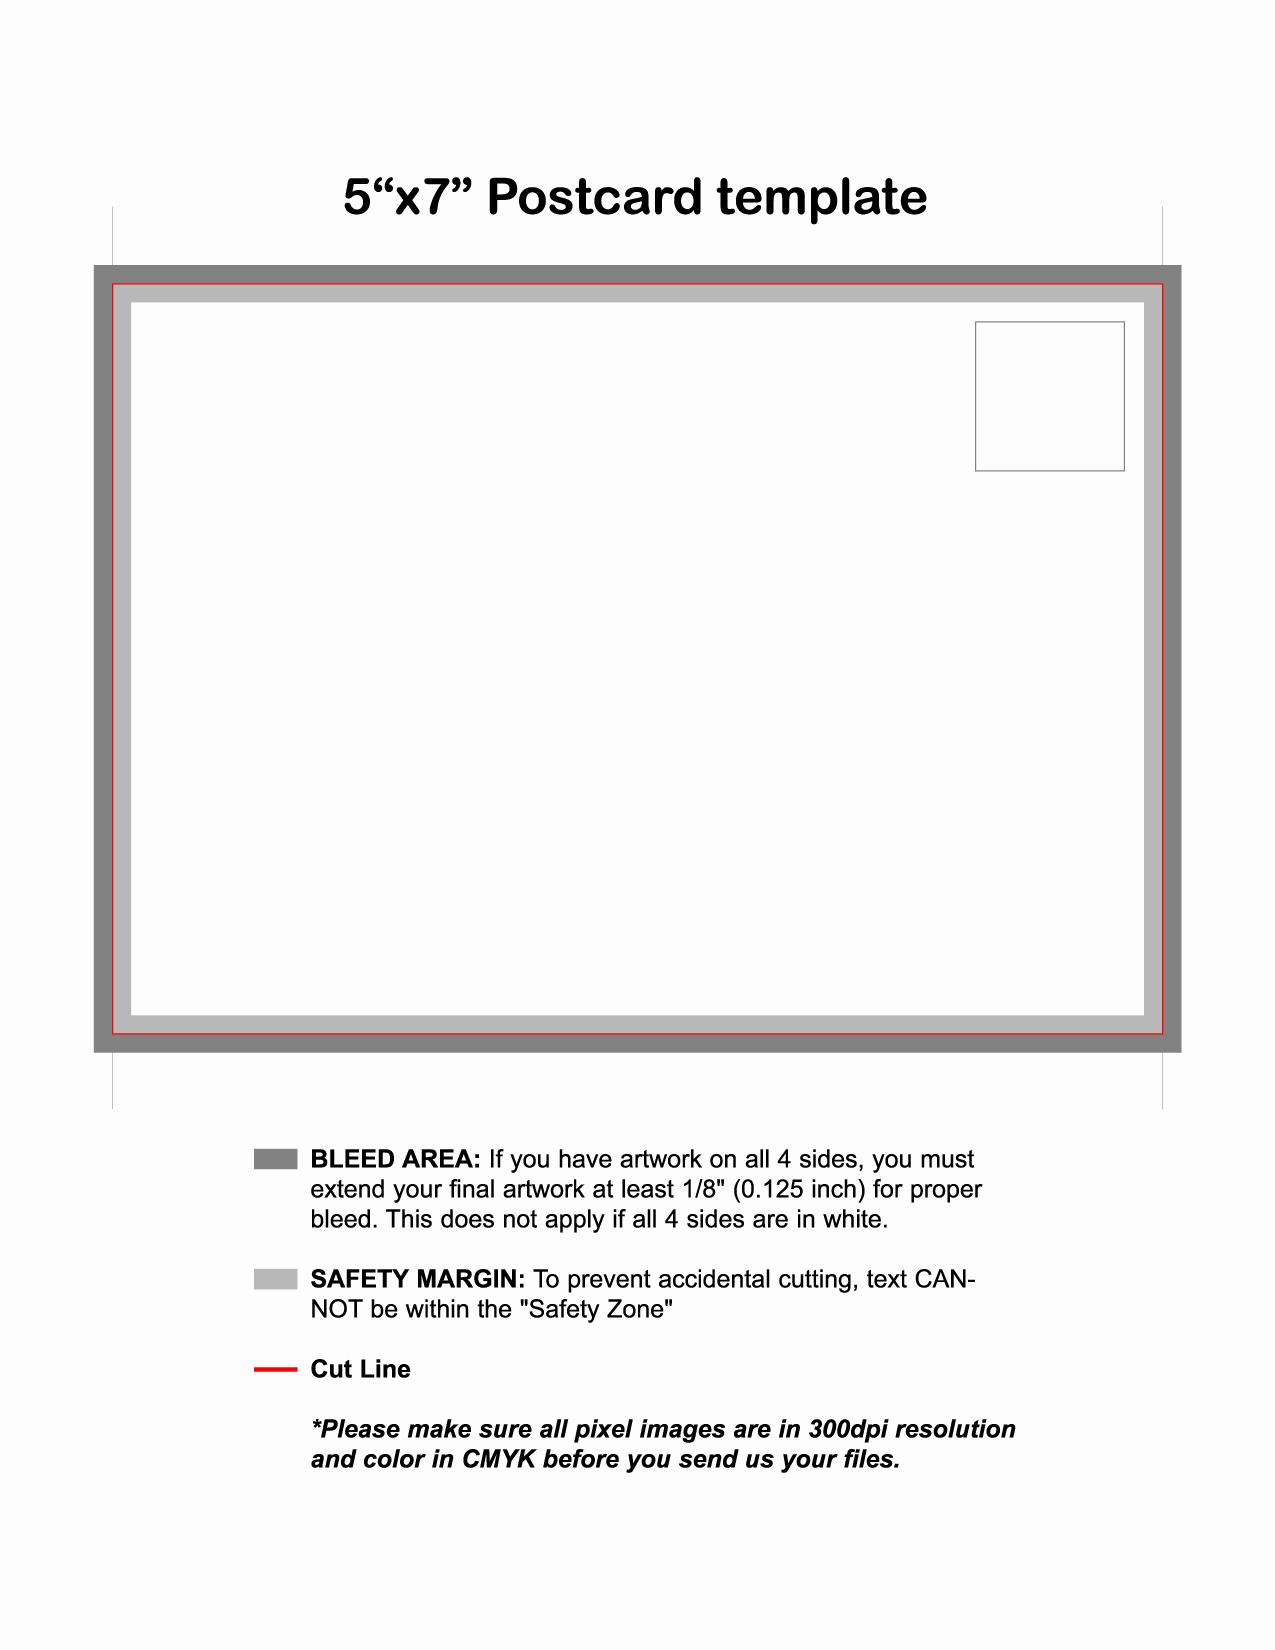 5x7 Greeting Card Template Word Elegant 4x6 Postcard Template Word Bing Images